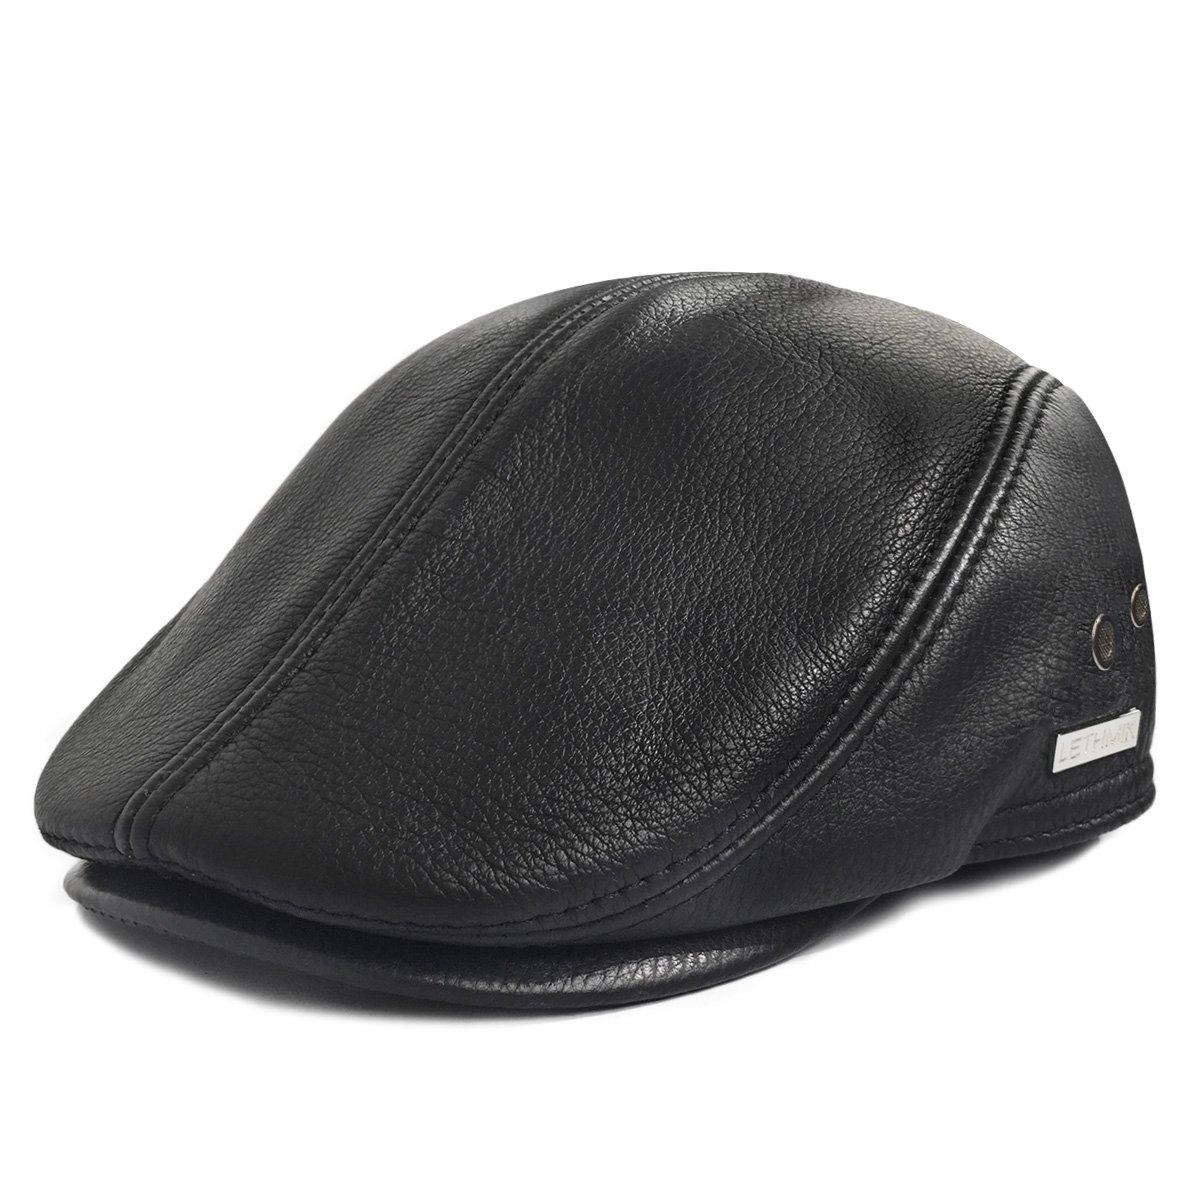 Amazon.com  LETHMIK Flat Cap Cabby Hat Genuine Leather Vintage Newsboy Cap  Ivy Driving Cap  Sports   Outdoors b7ce821ccdd